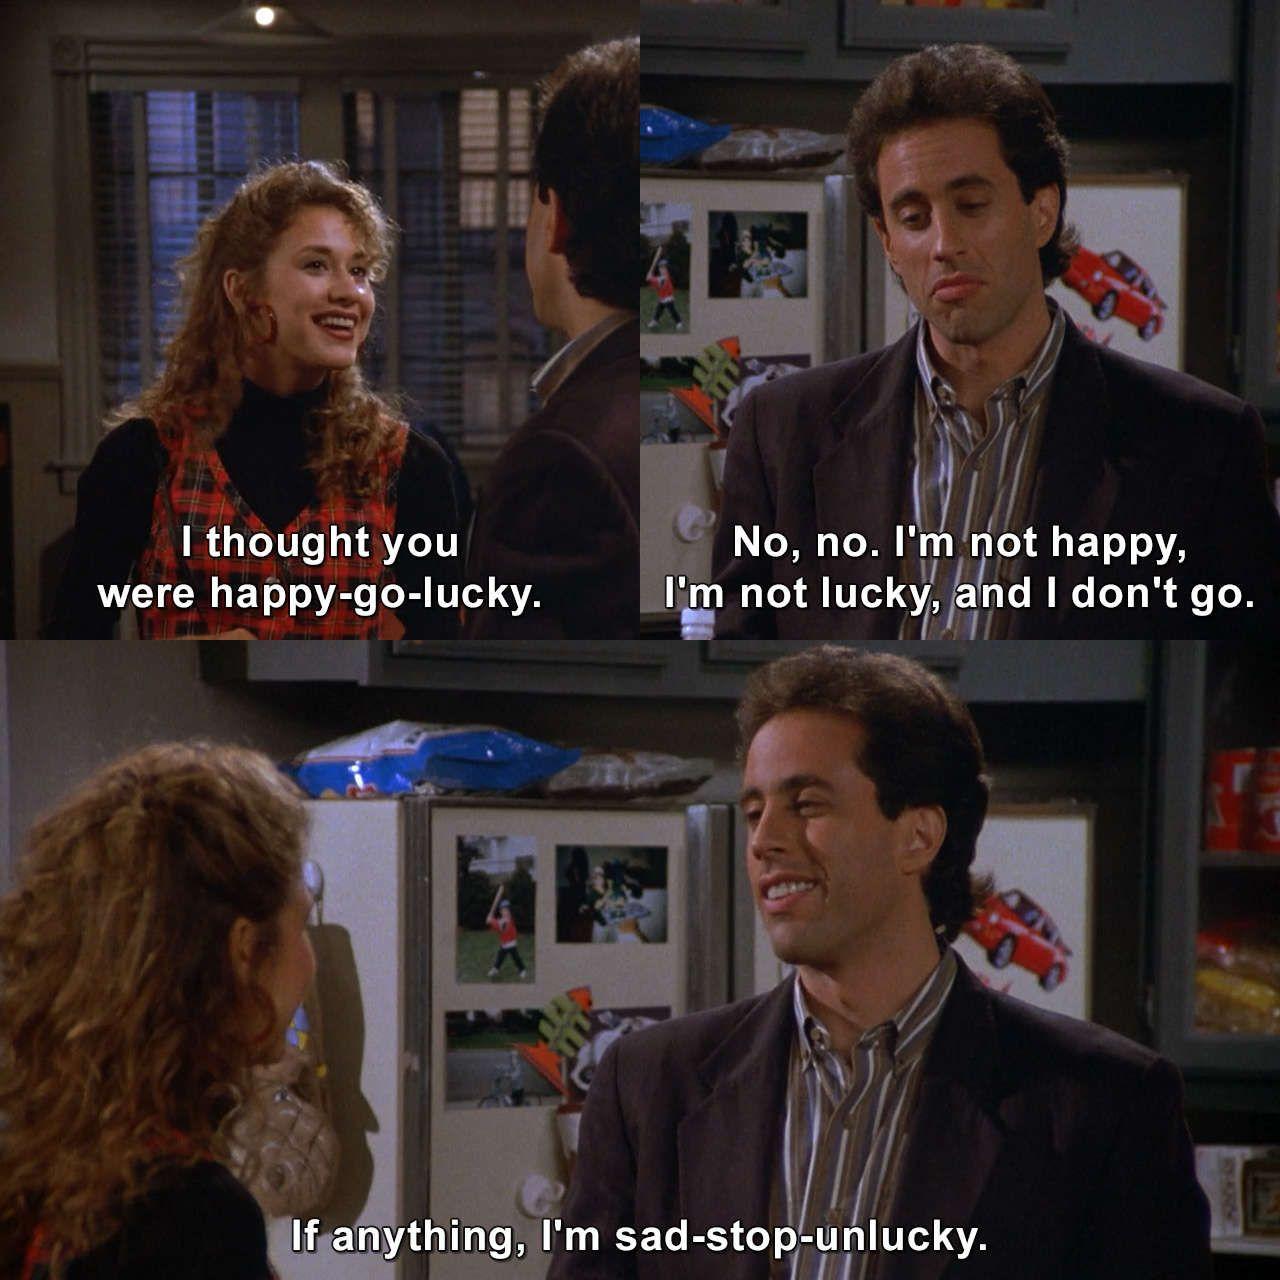 Seinfeld The Bubble Boy Jerryseinfeld Seinfeld Thebubbleboy Memes Comedy Seinfeld Seinfeld Funny Seinfeld Quotes